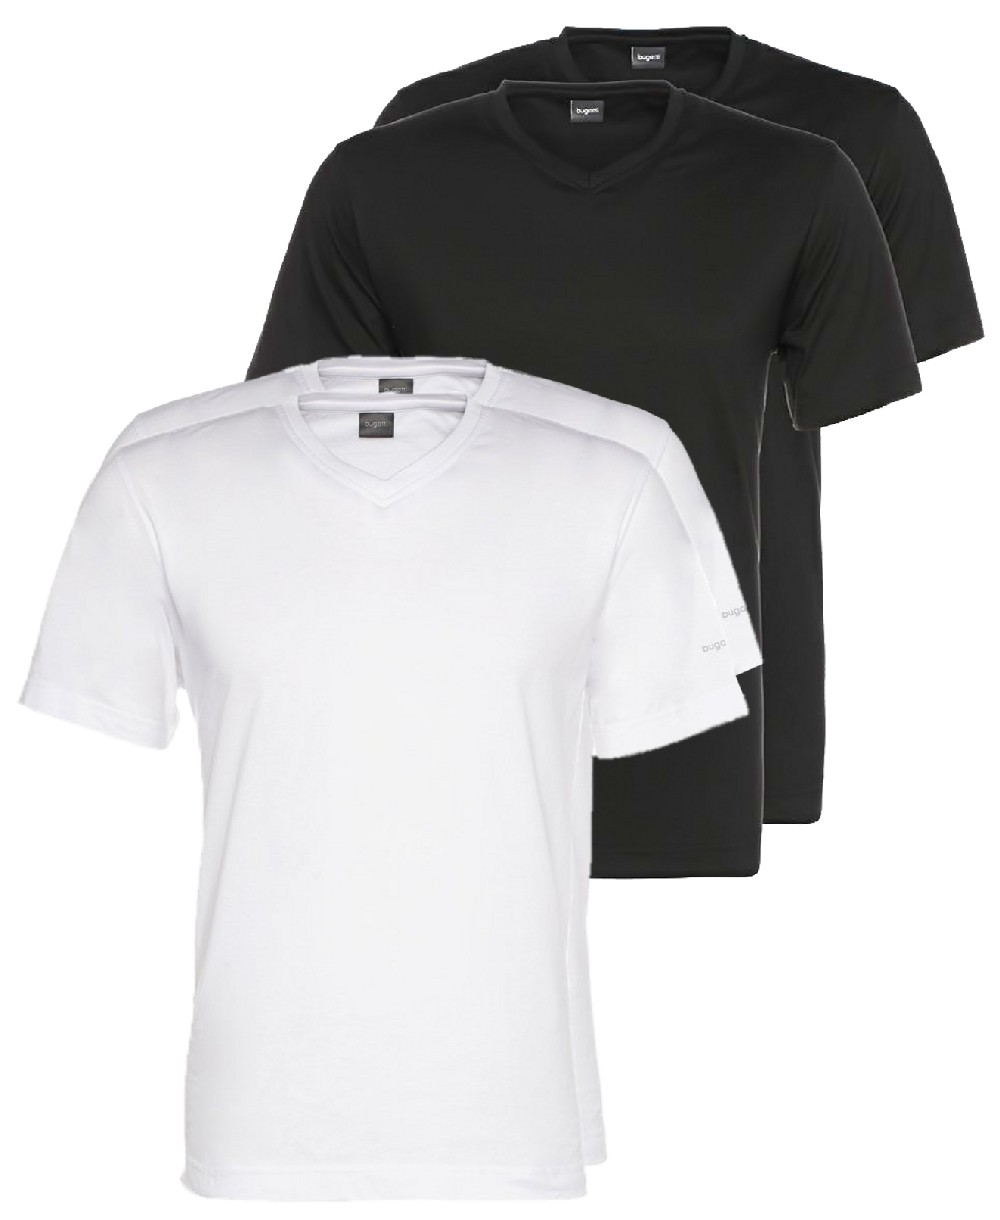 bugatti v neck t shirt doppelpack schwarz oder weiss 37246 hochwertige herrenmode f hrender. Black Bedroom Furniture Sets. Home Design Ideas